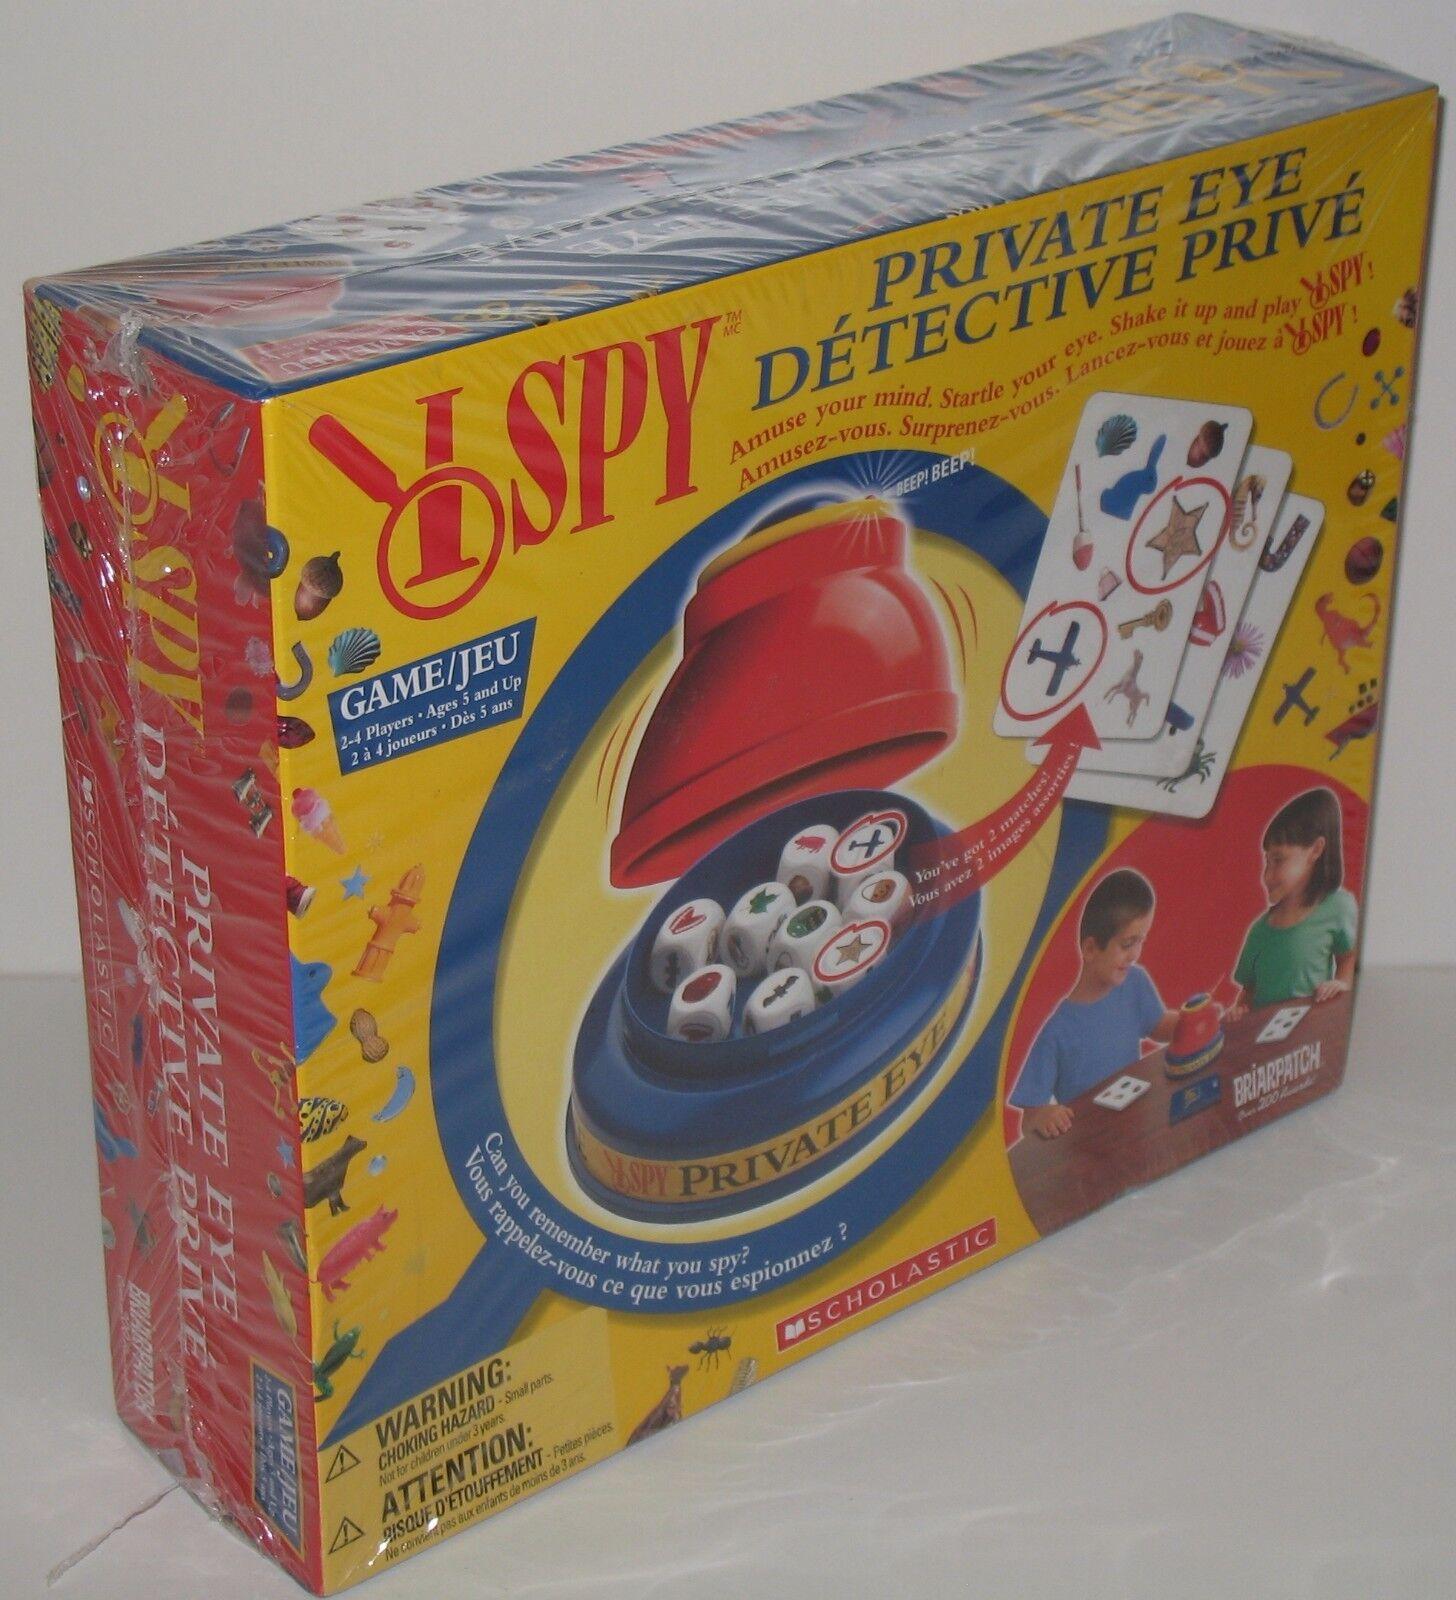 I Spy Private Eye gioco nuovo Sealed - WRAP  mostrareS WEAR  acquista marca